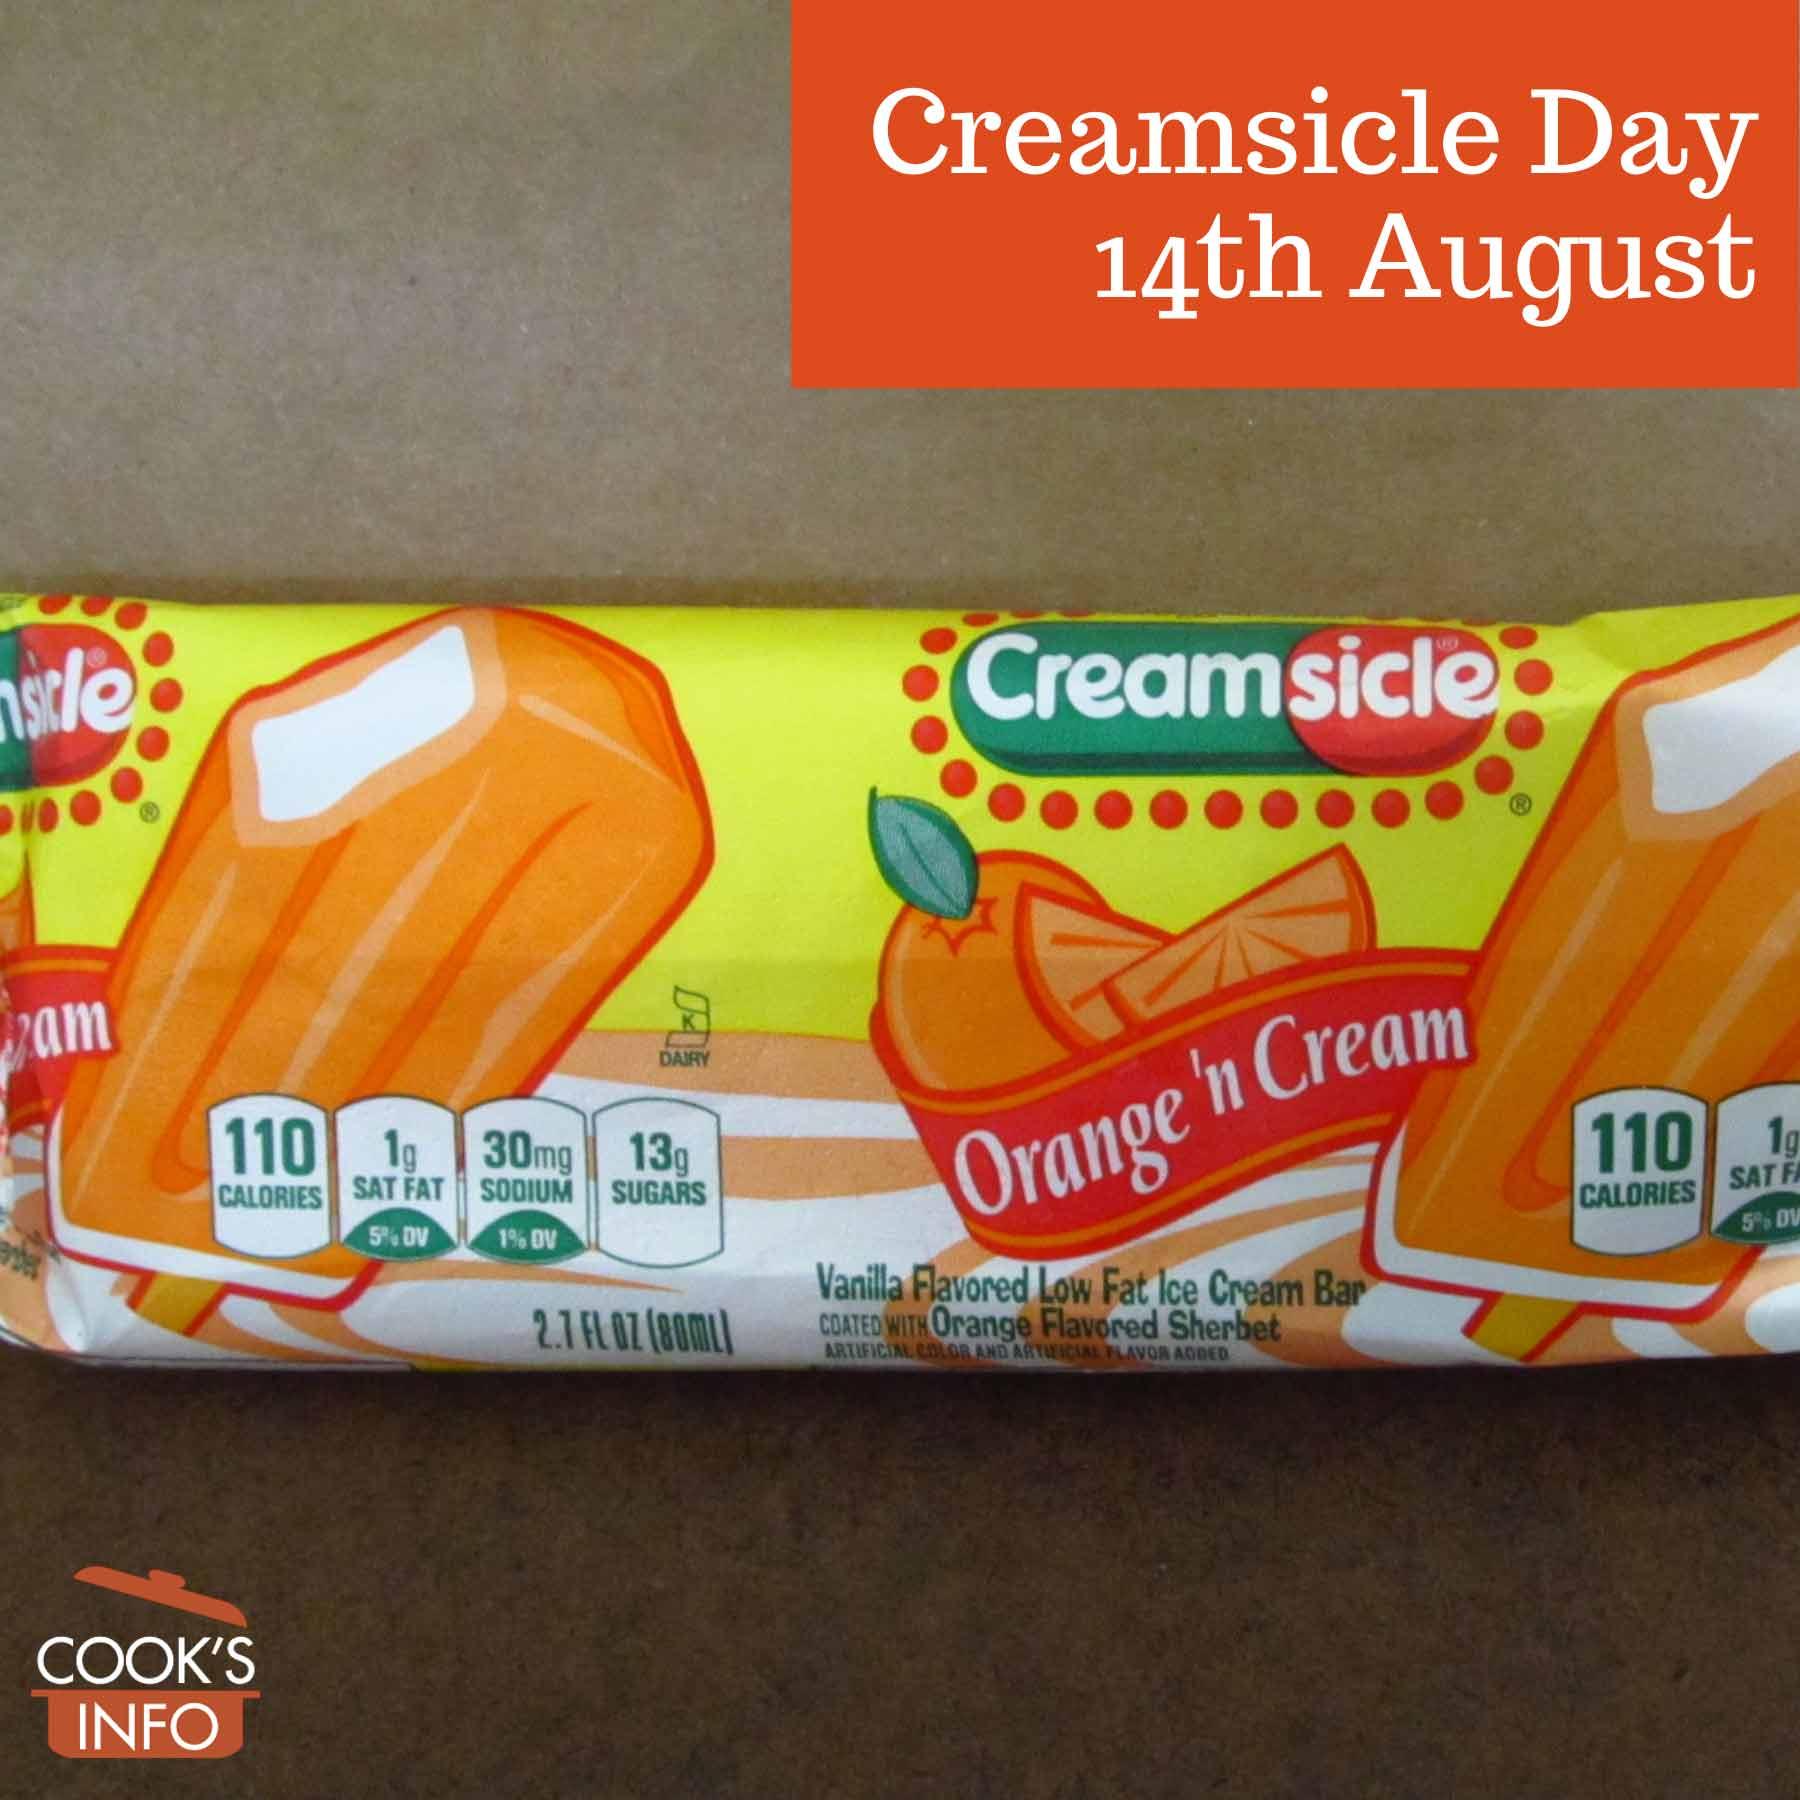 Creamsicle in package